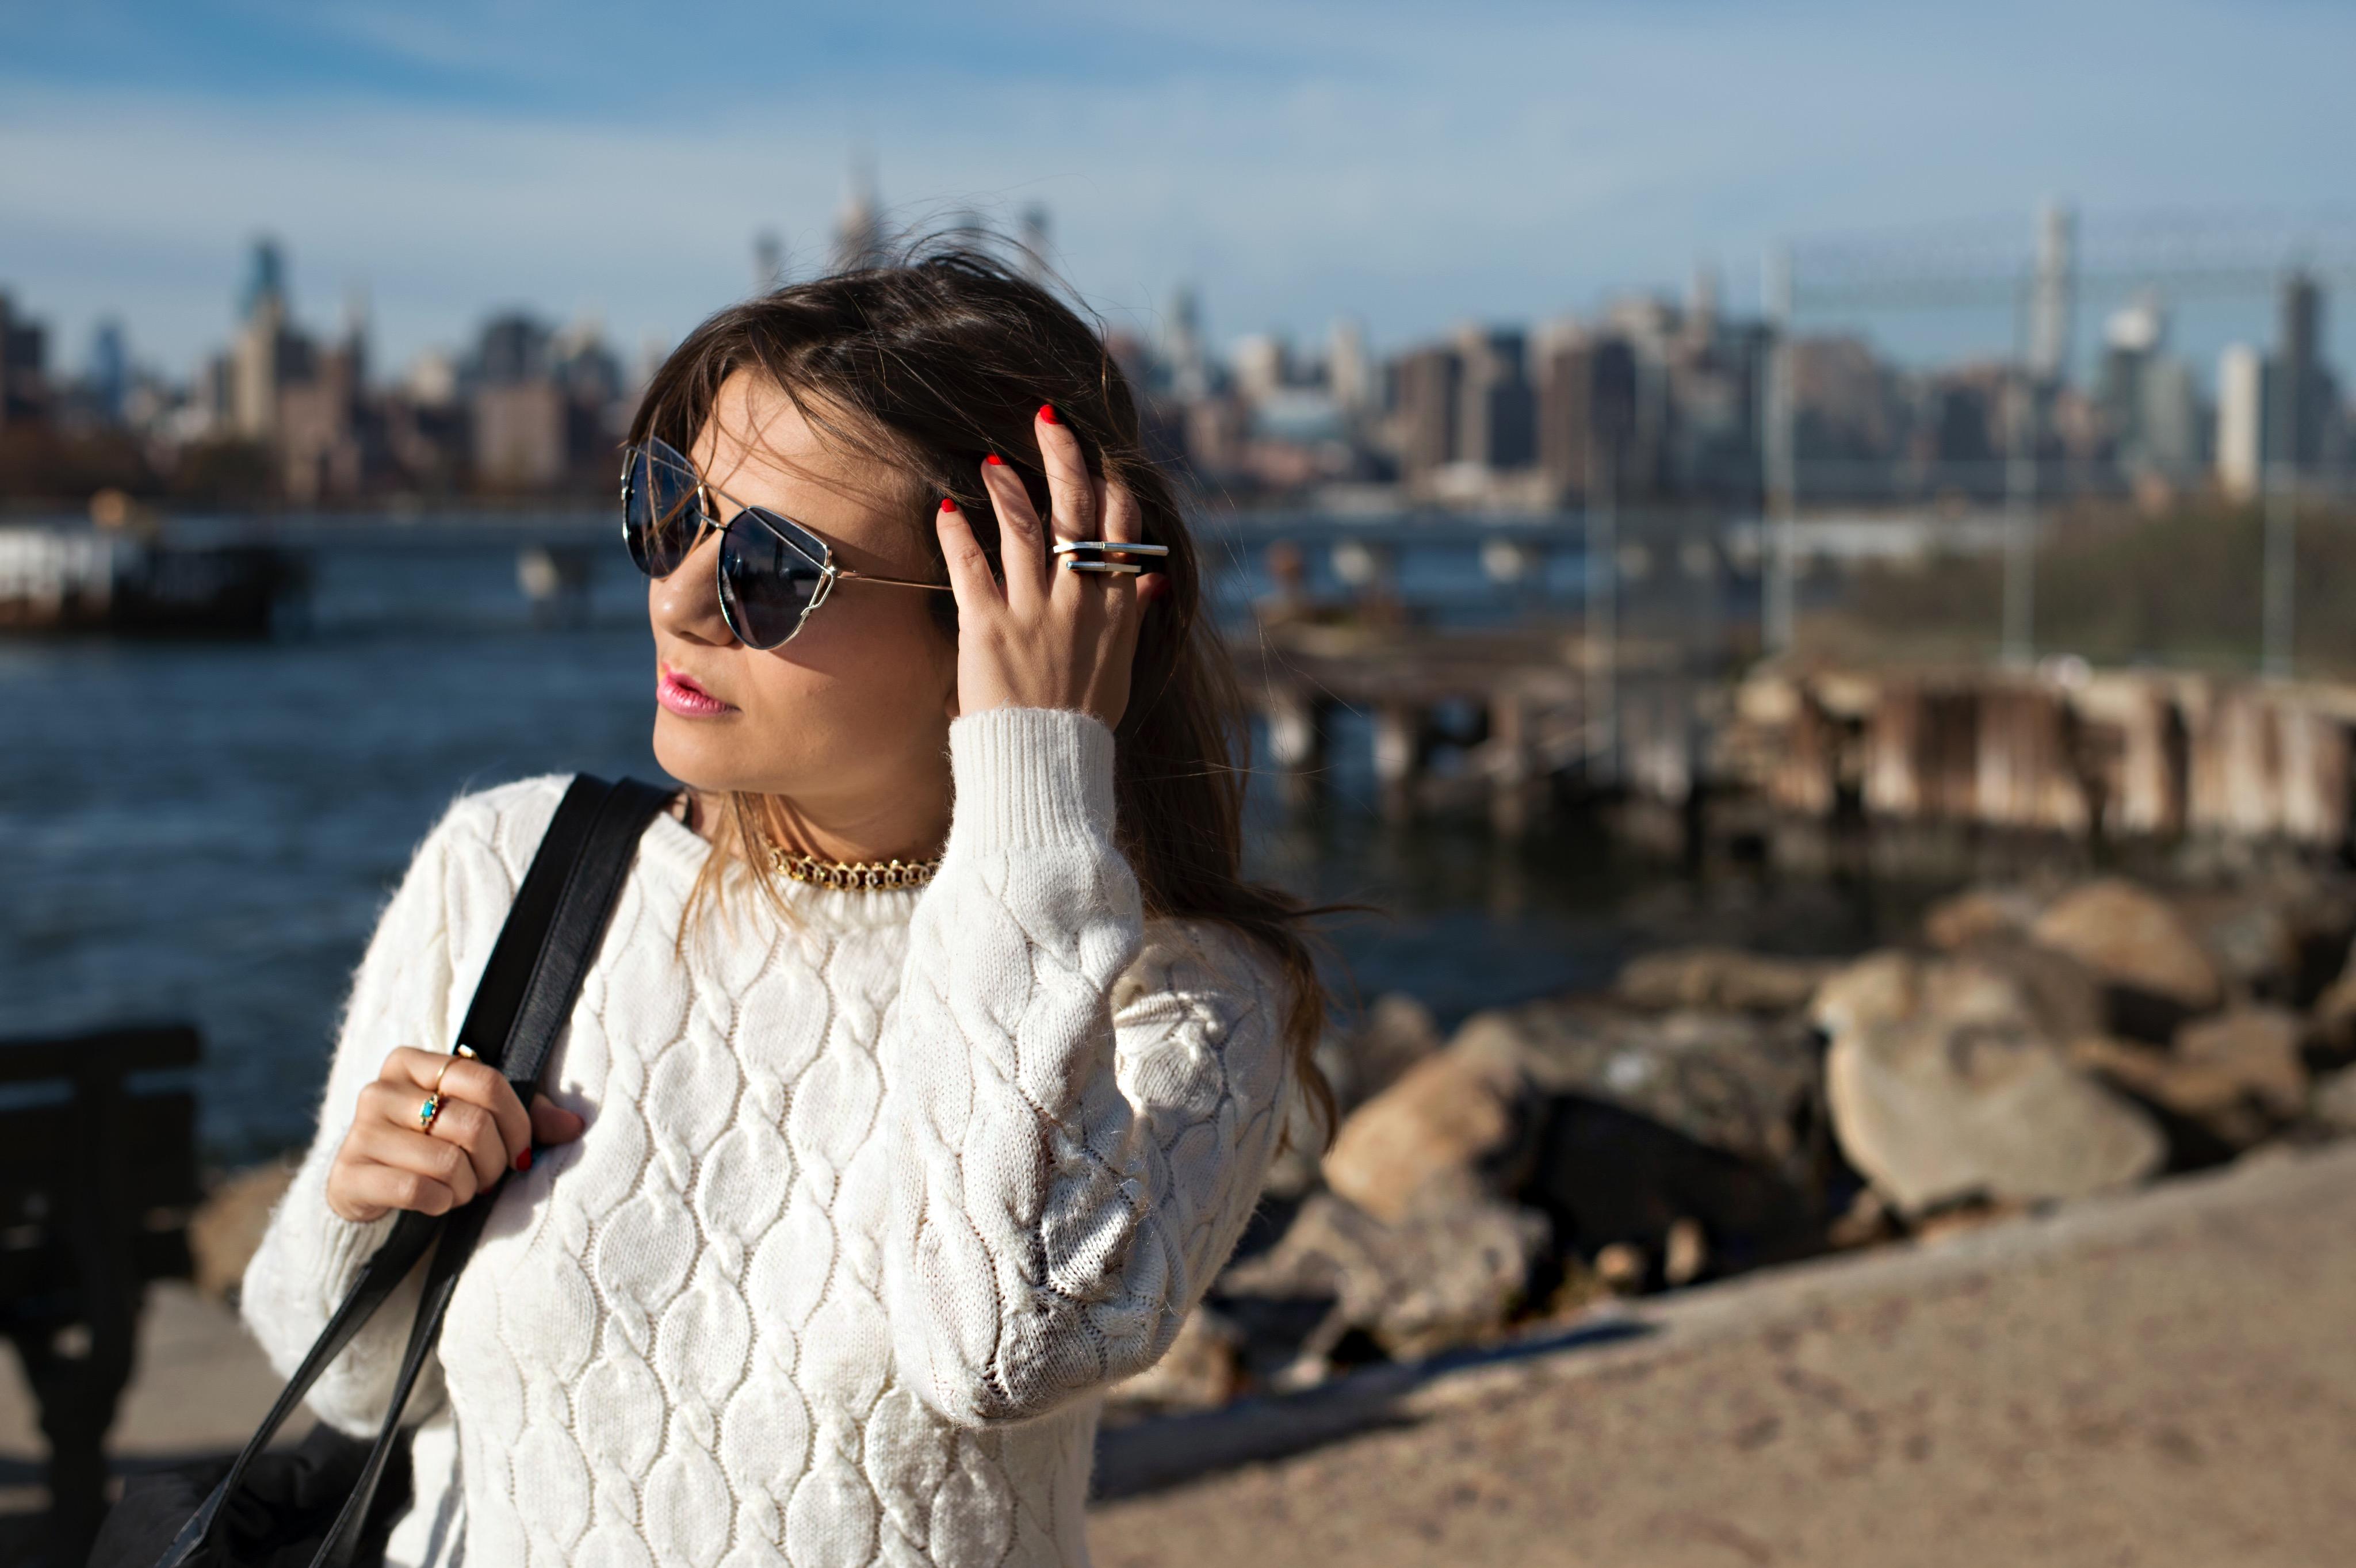 sparkle-boots-leather-skirts-alley-girl-betul-yildiz-new-york-fashion-blogger-7